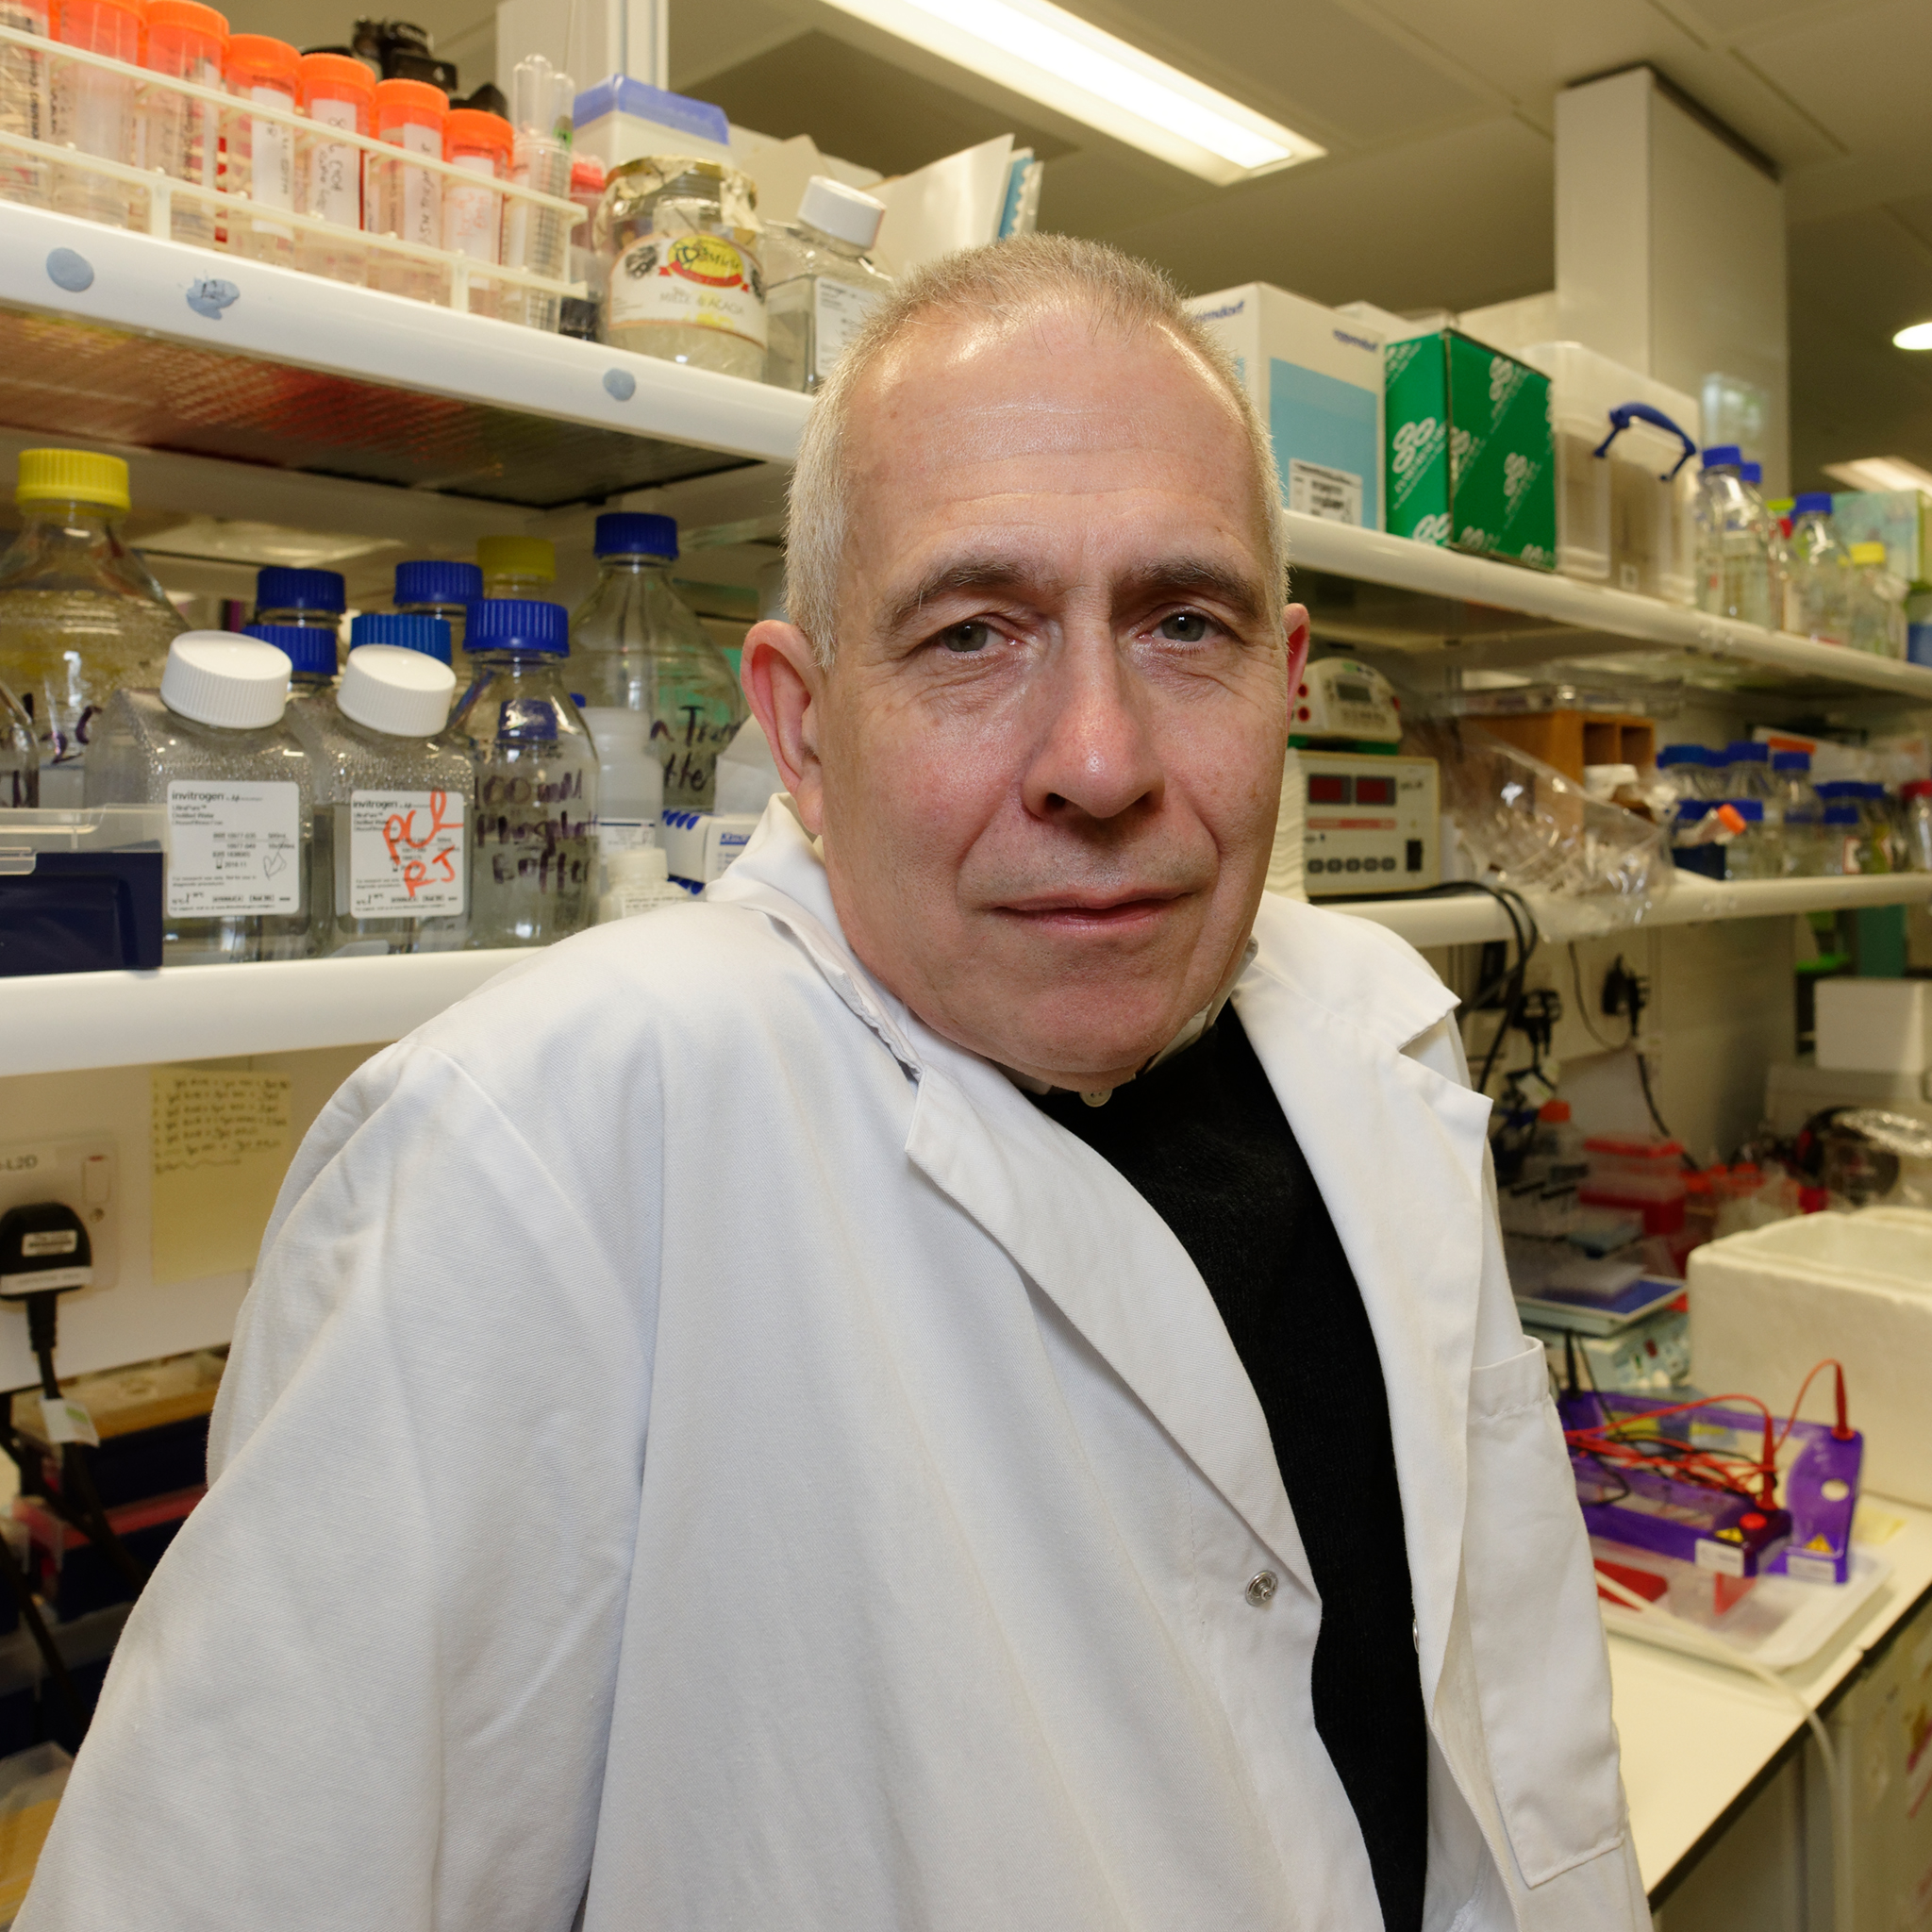 Jim, The 'accidental biologist'